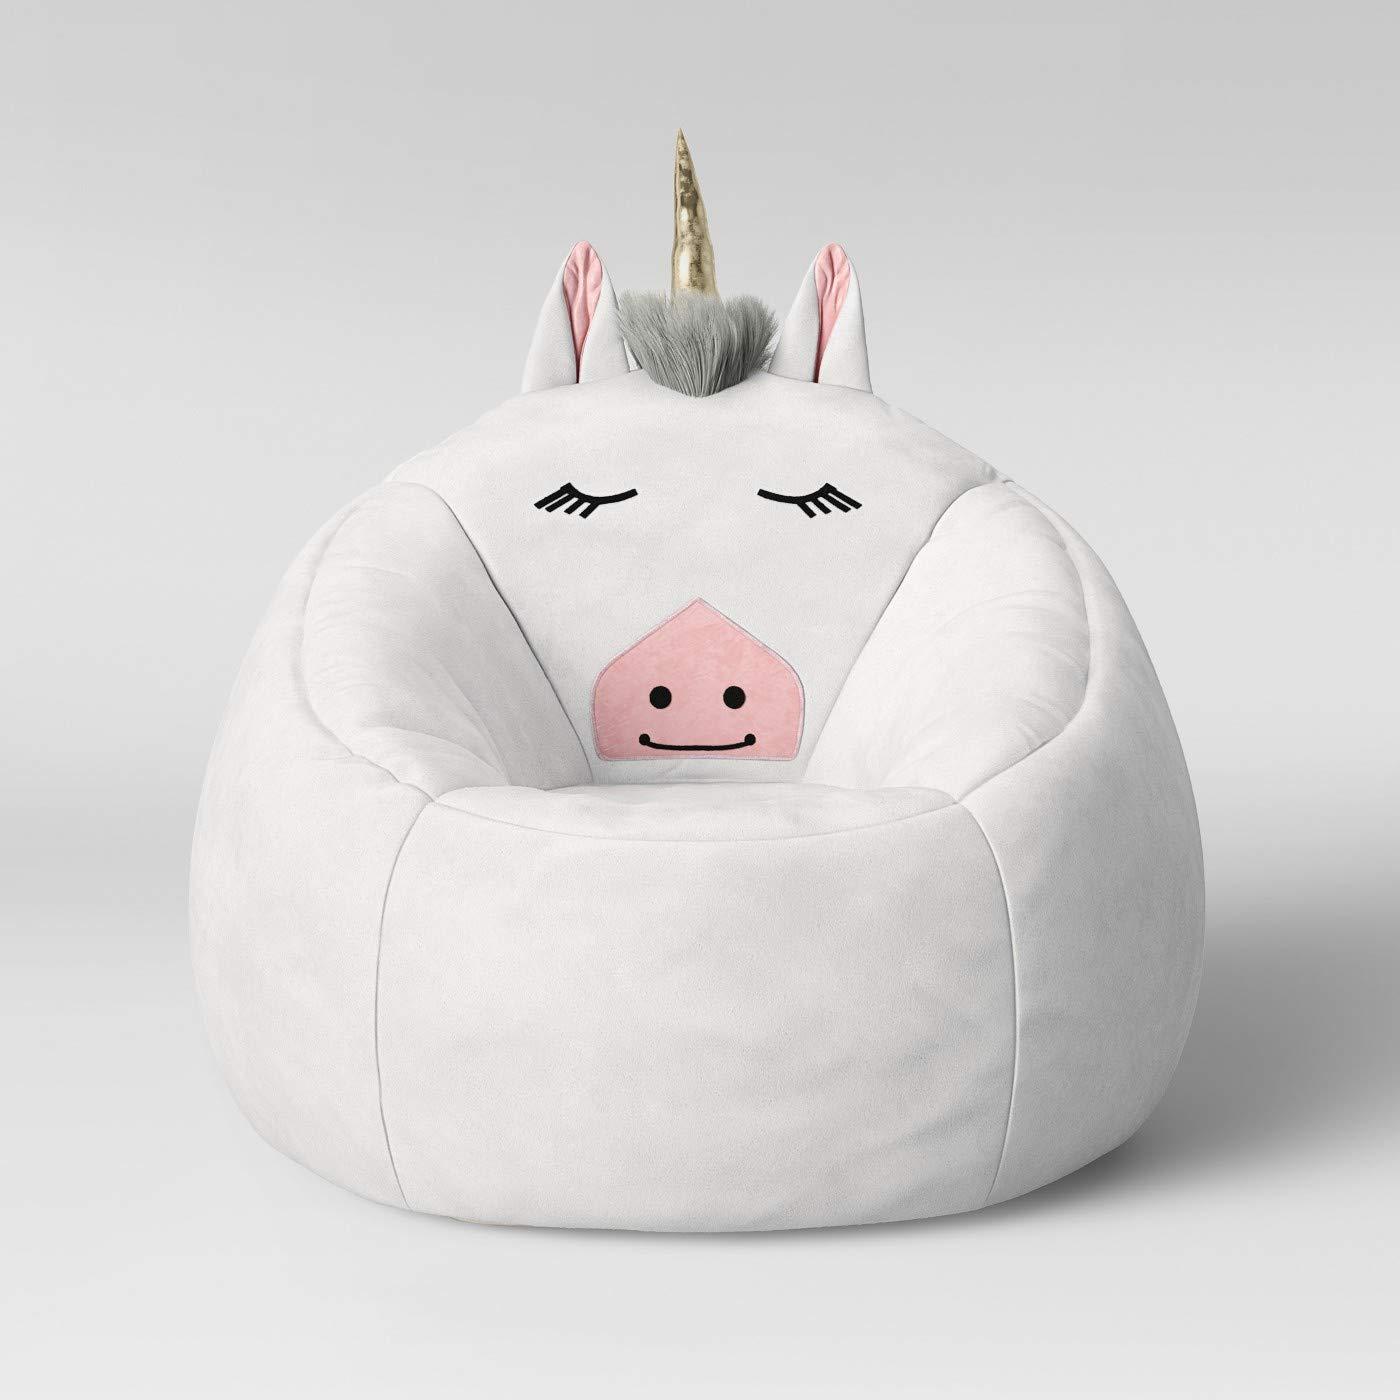 Prime Amazon Com White Unicorn Childrens Bean Bag Chair Kitchen Gamerscity Chair Design For Home Gamerscityorg